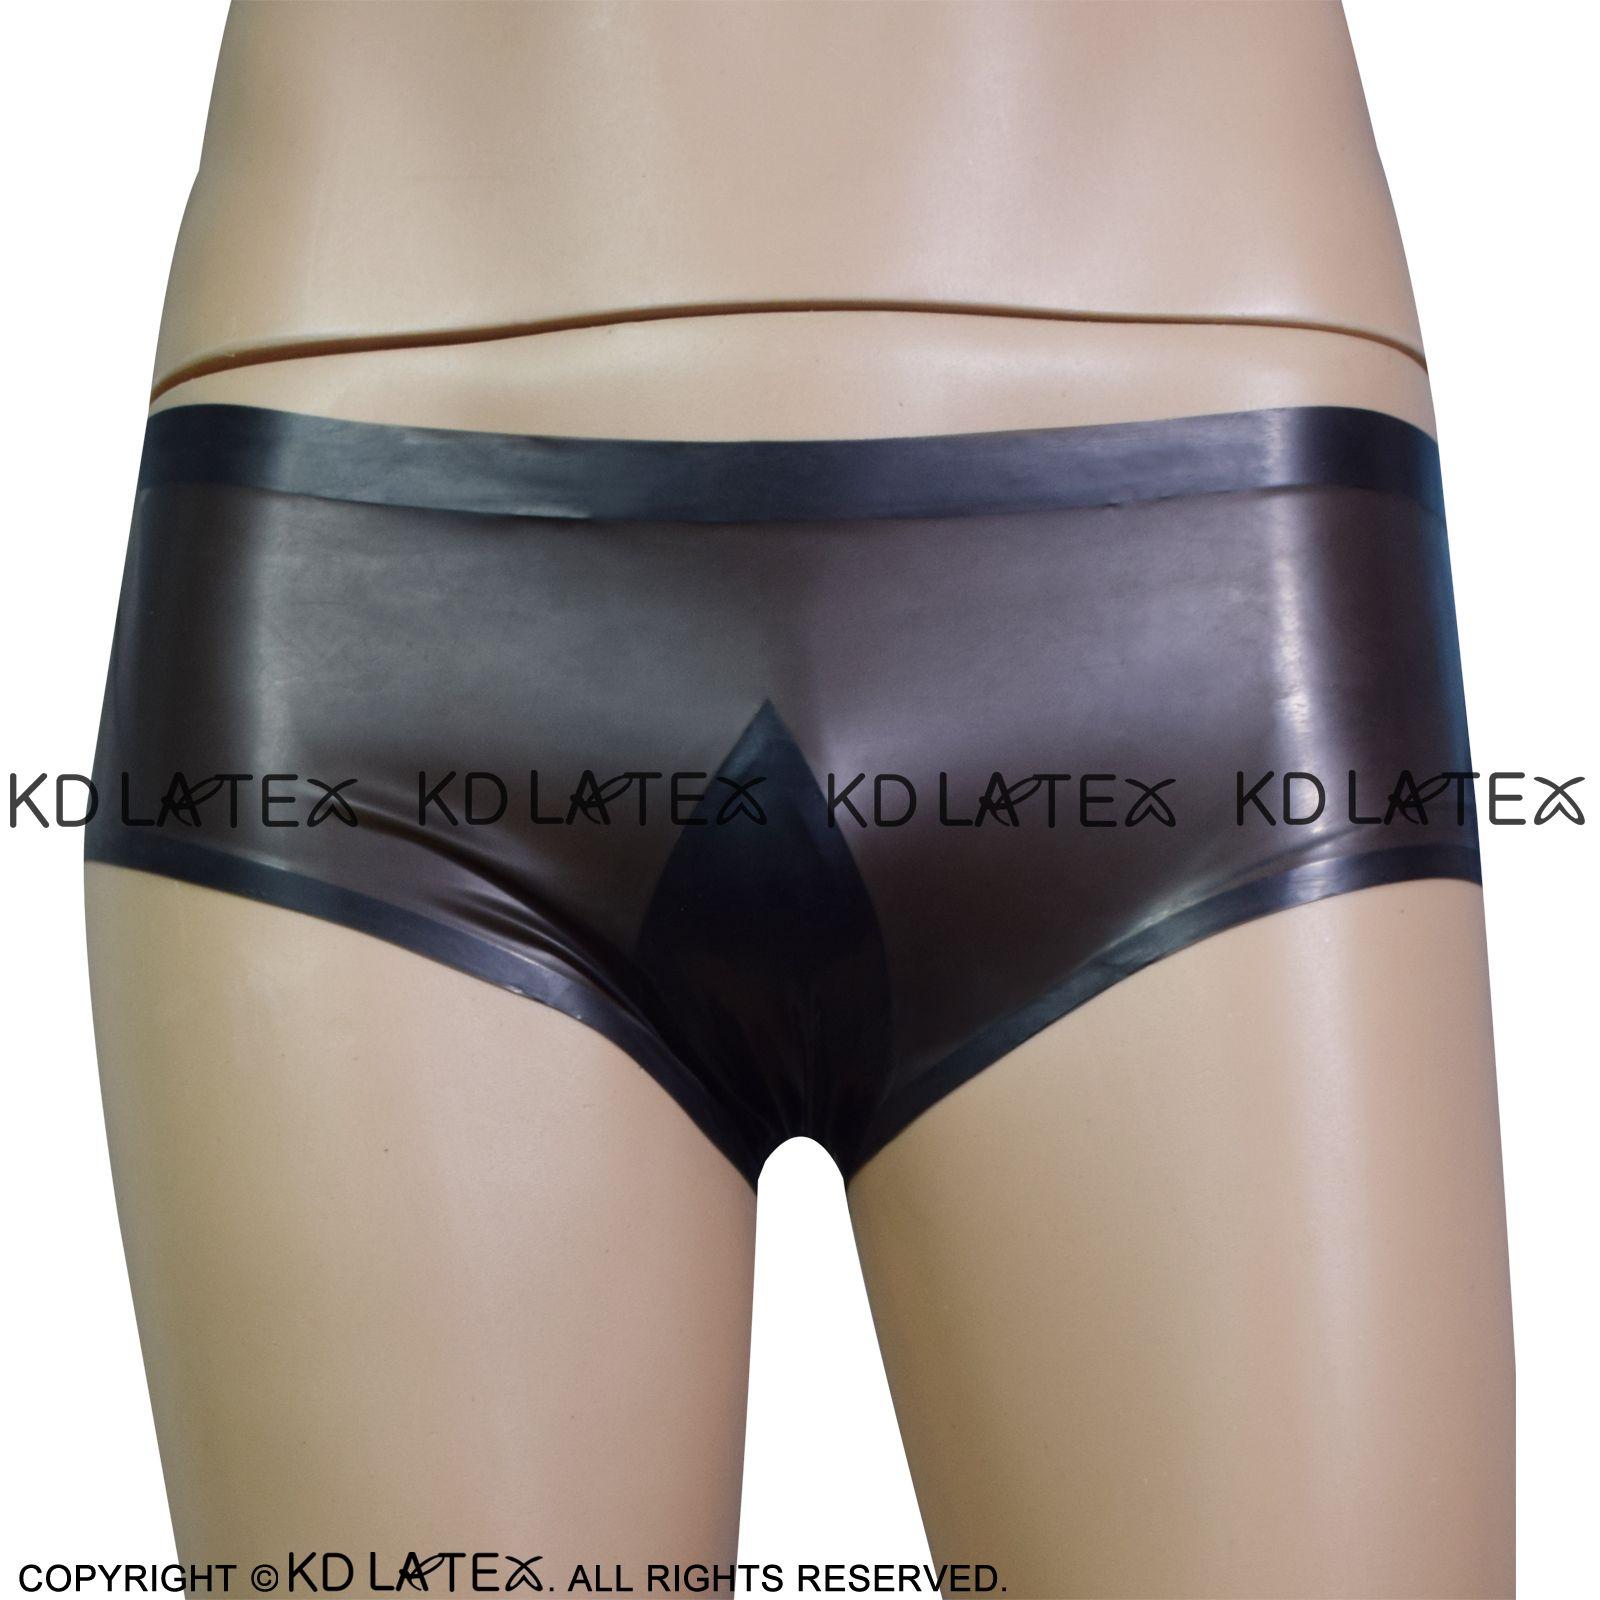 Forced Latex Panties Pic